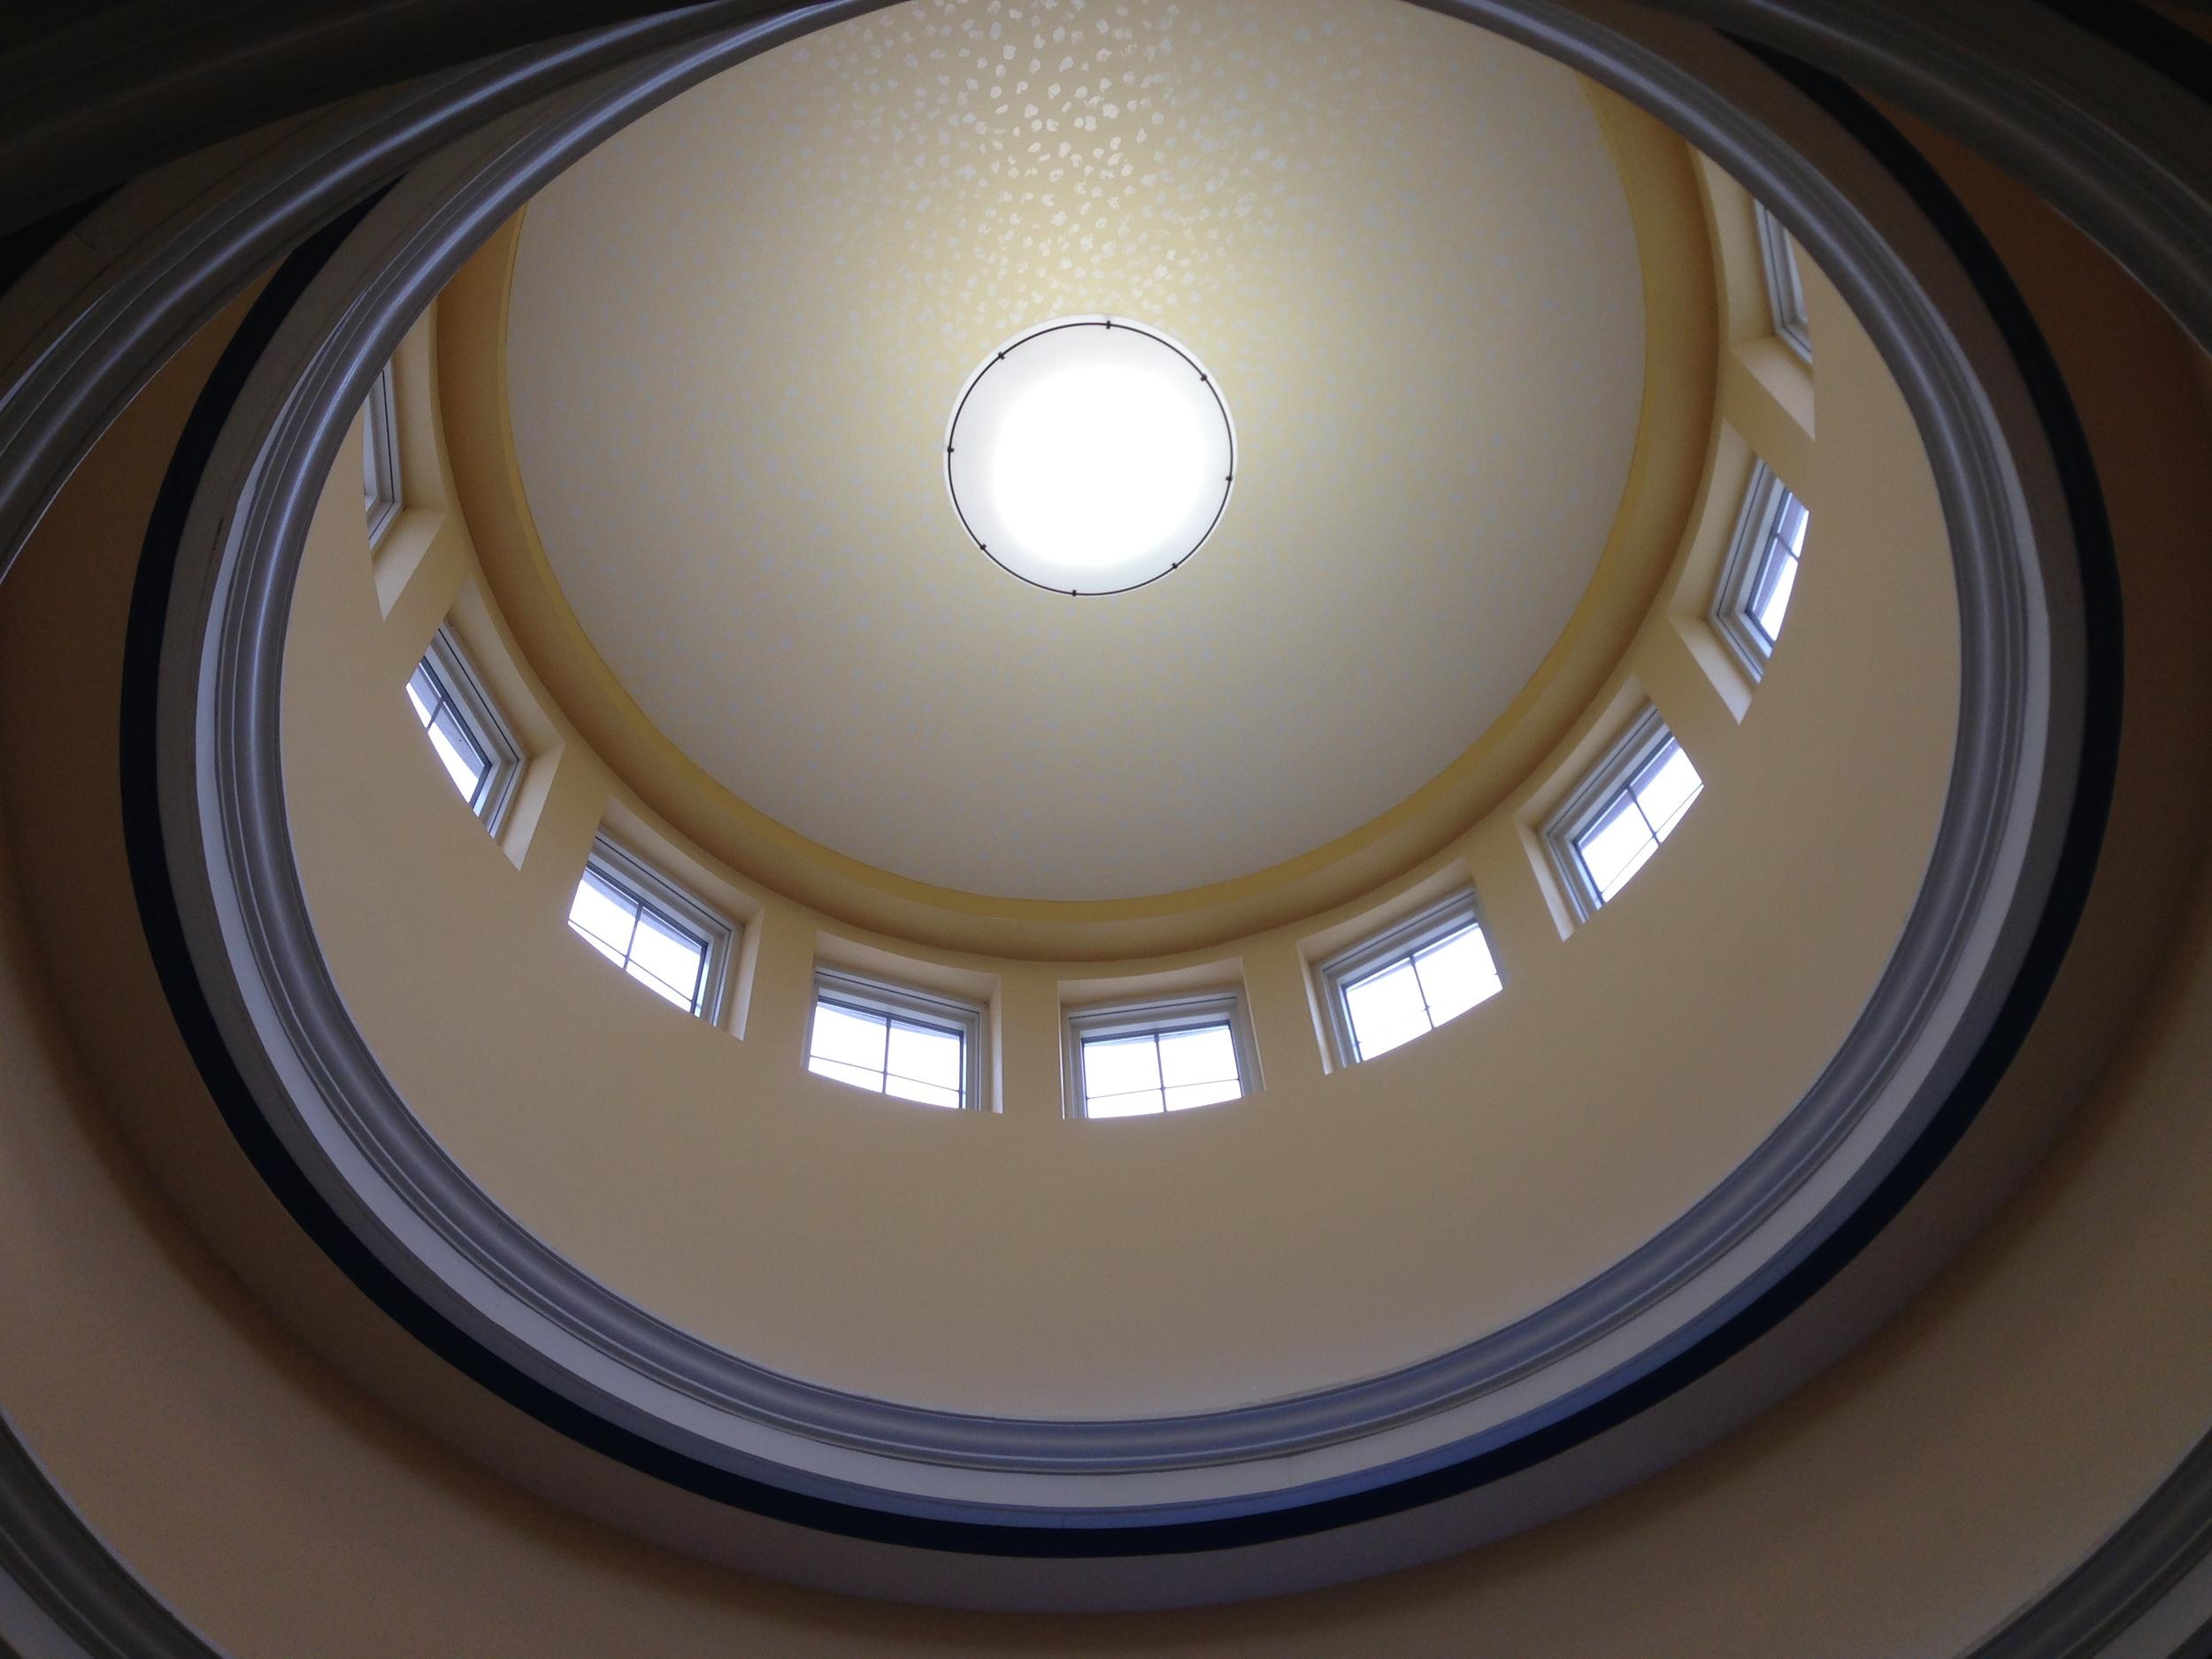 www.rcmarchitects.com - findlay city schools - glenwood middle school (5)